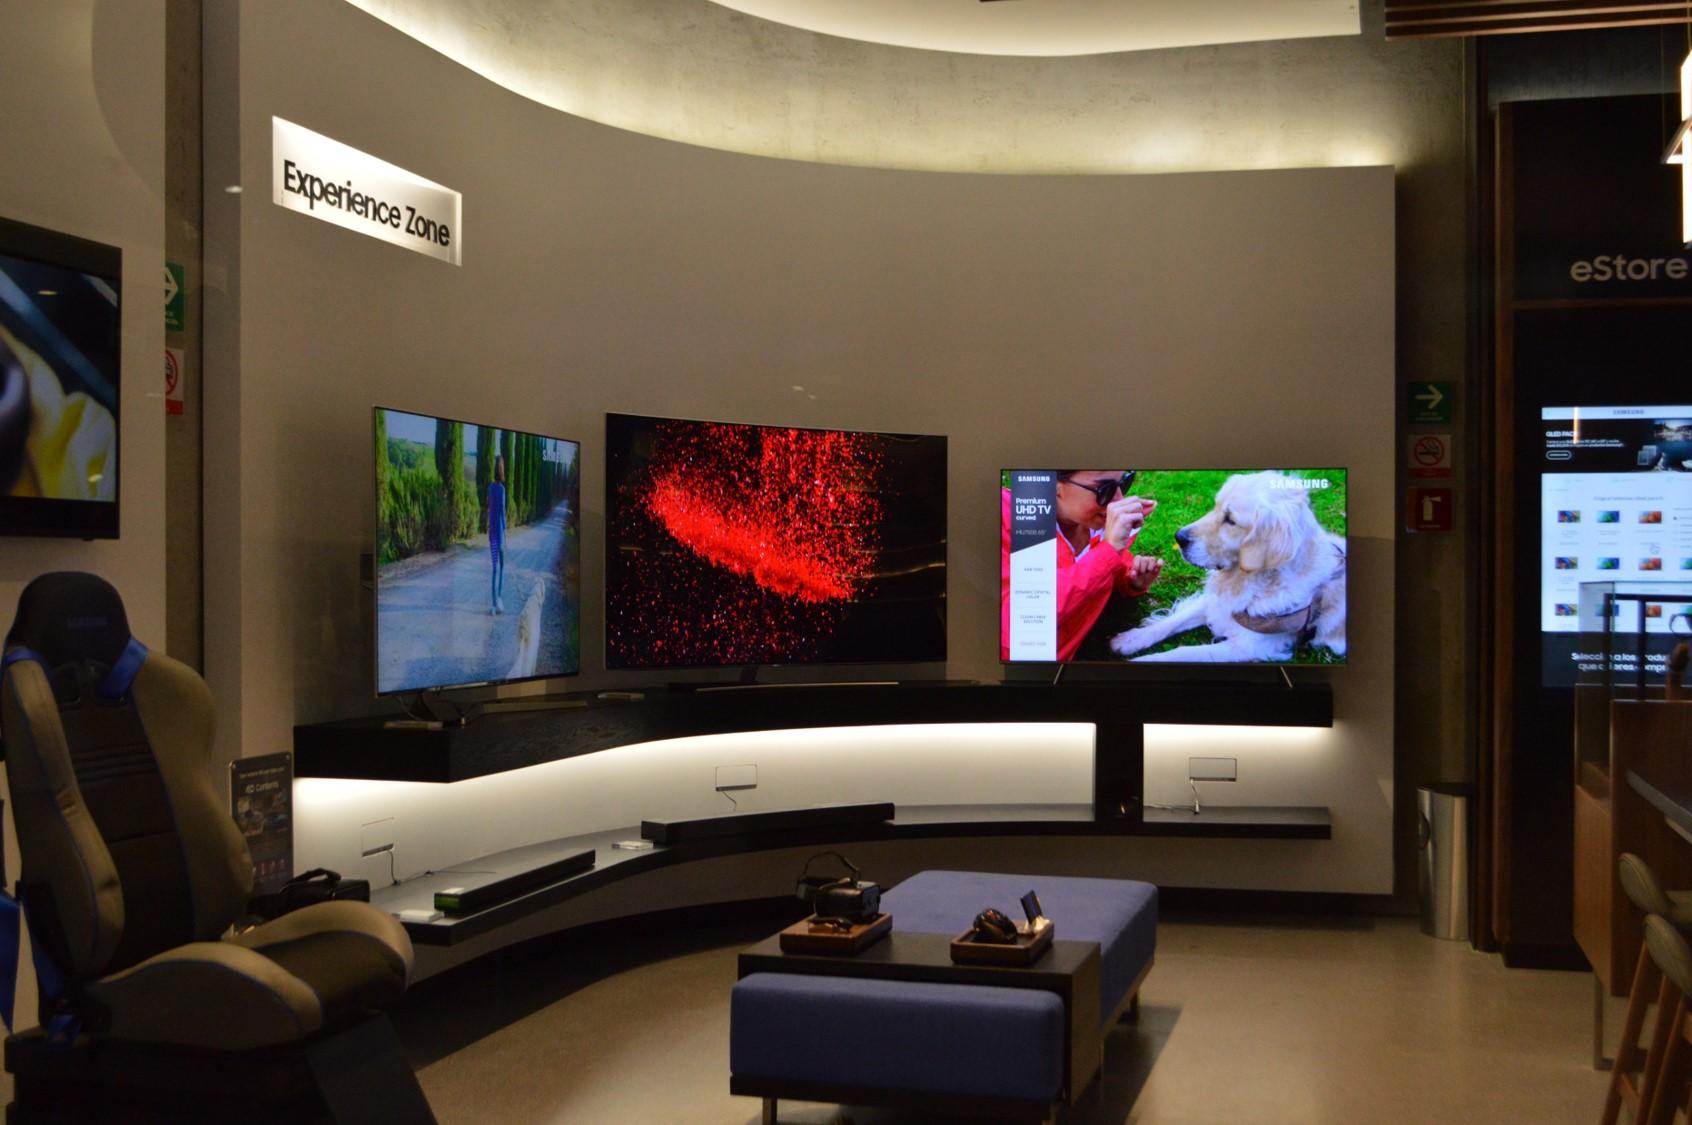 Samsung Experience zone